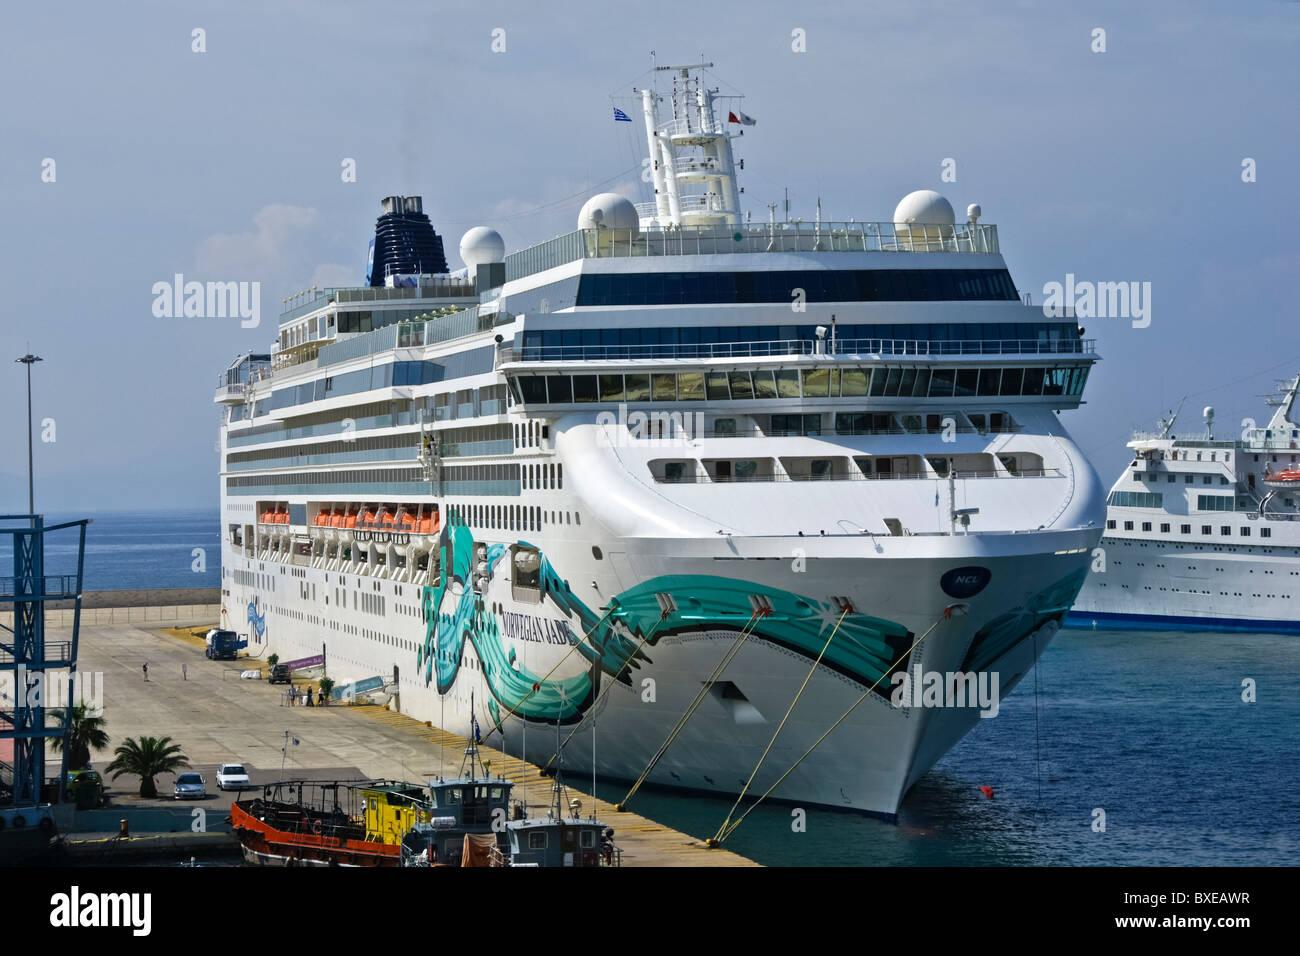 Norwegian Cruise Line cruise ship Norwegian Jade moored in Piraeus Greece - Stock Image